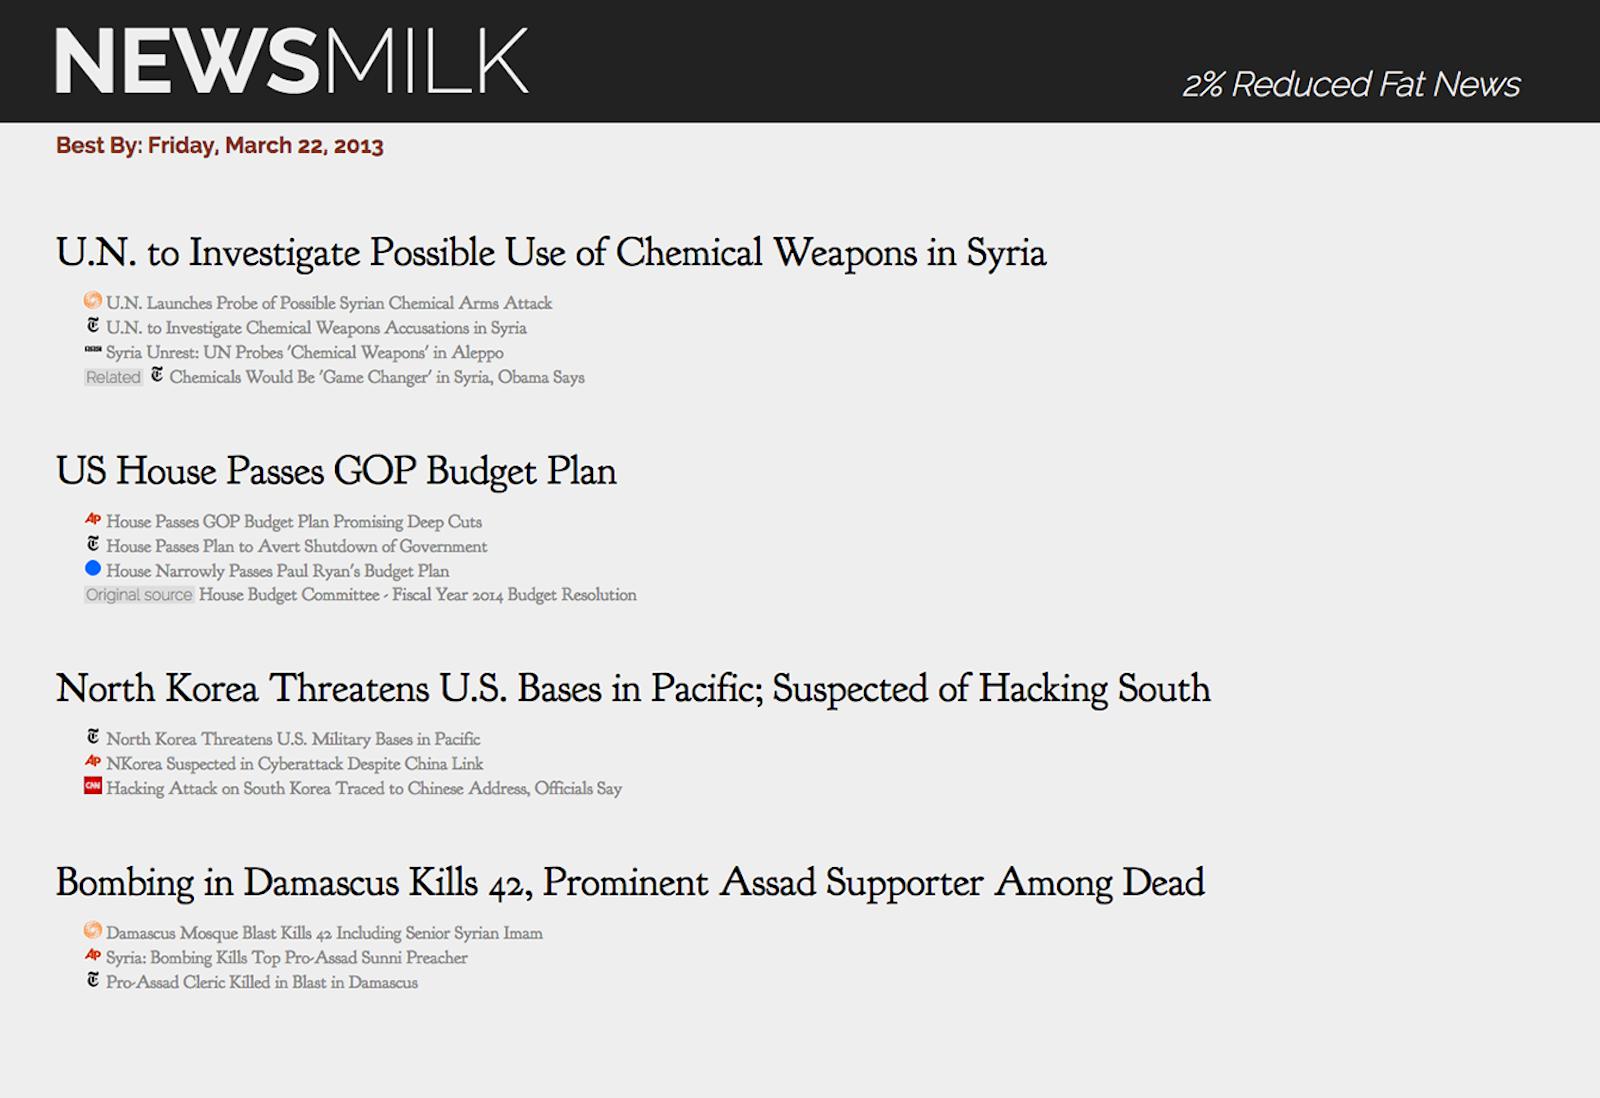 Newsmilk on March 22, 2013